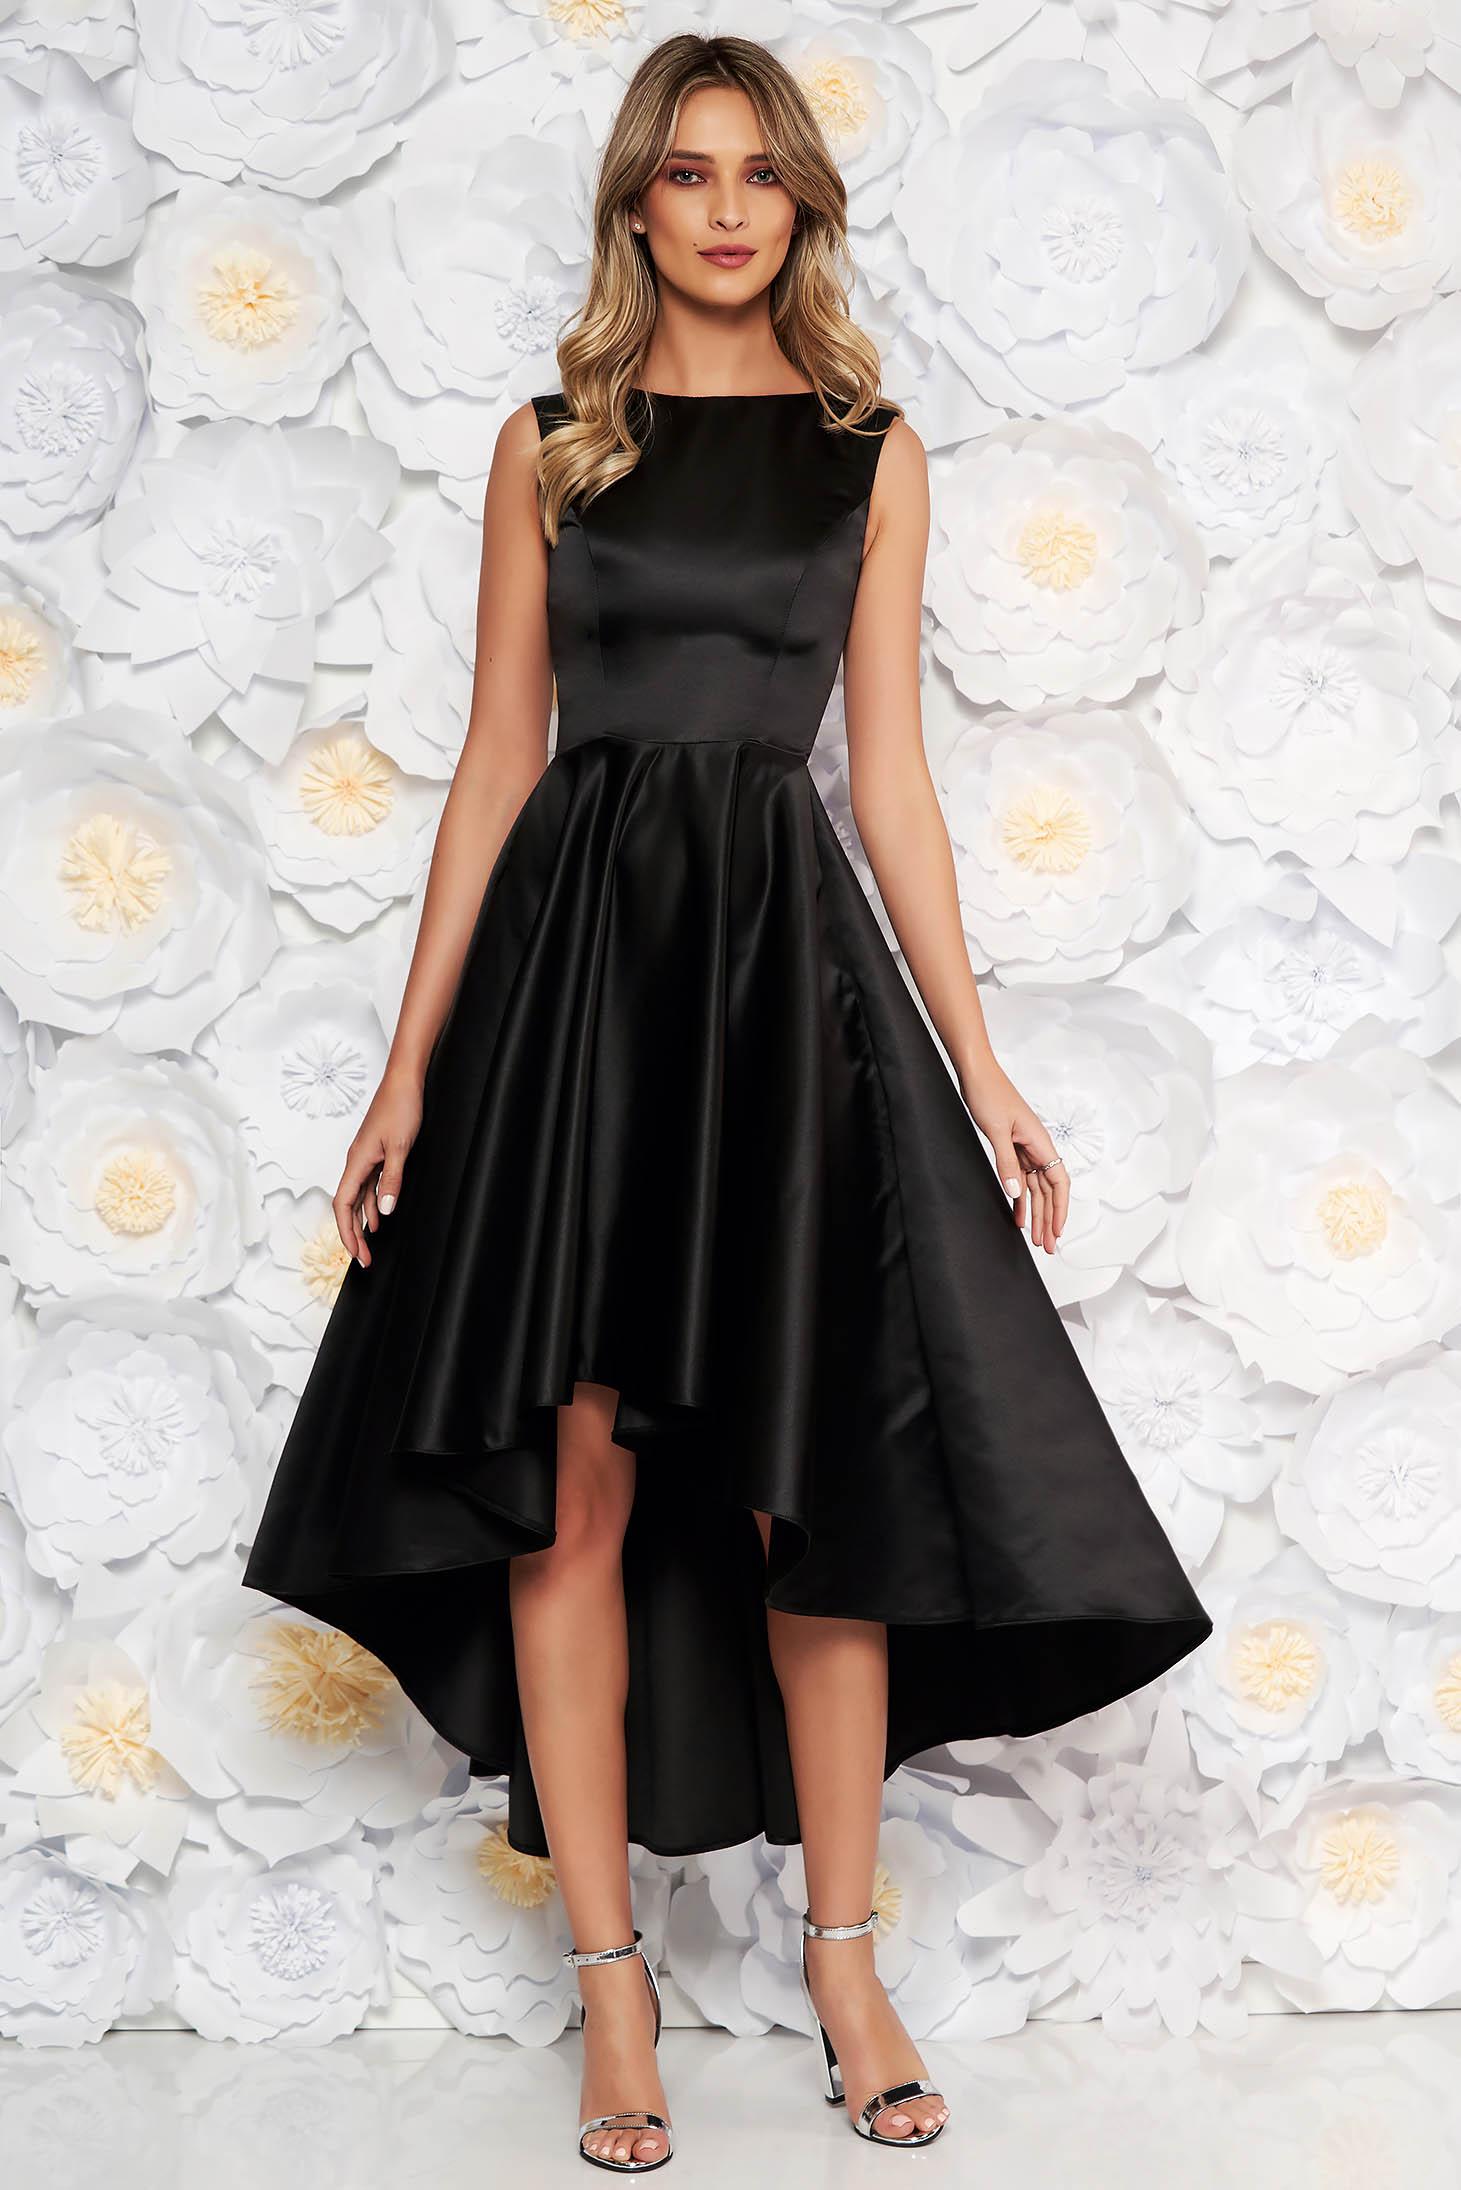 Black occasional asymmetrical cloche dress from satin fabric texture sleeveless elegant